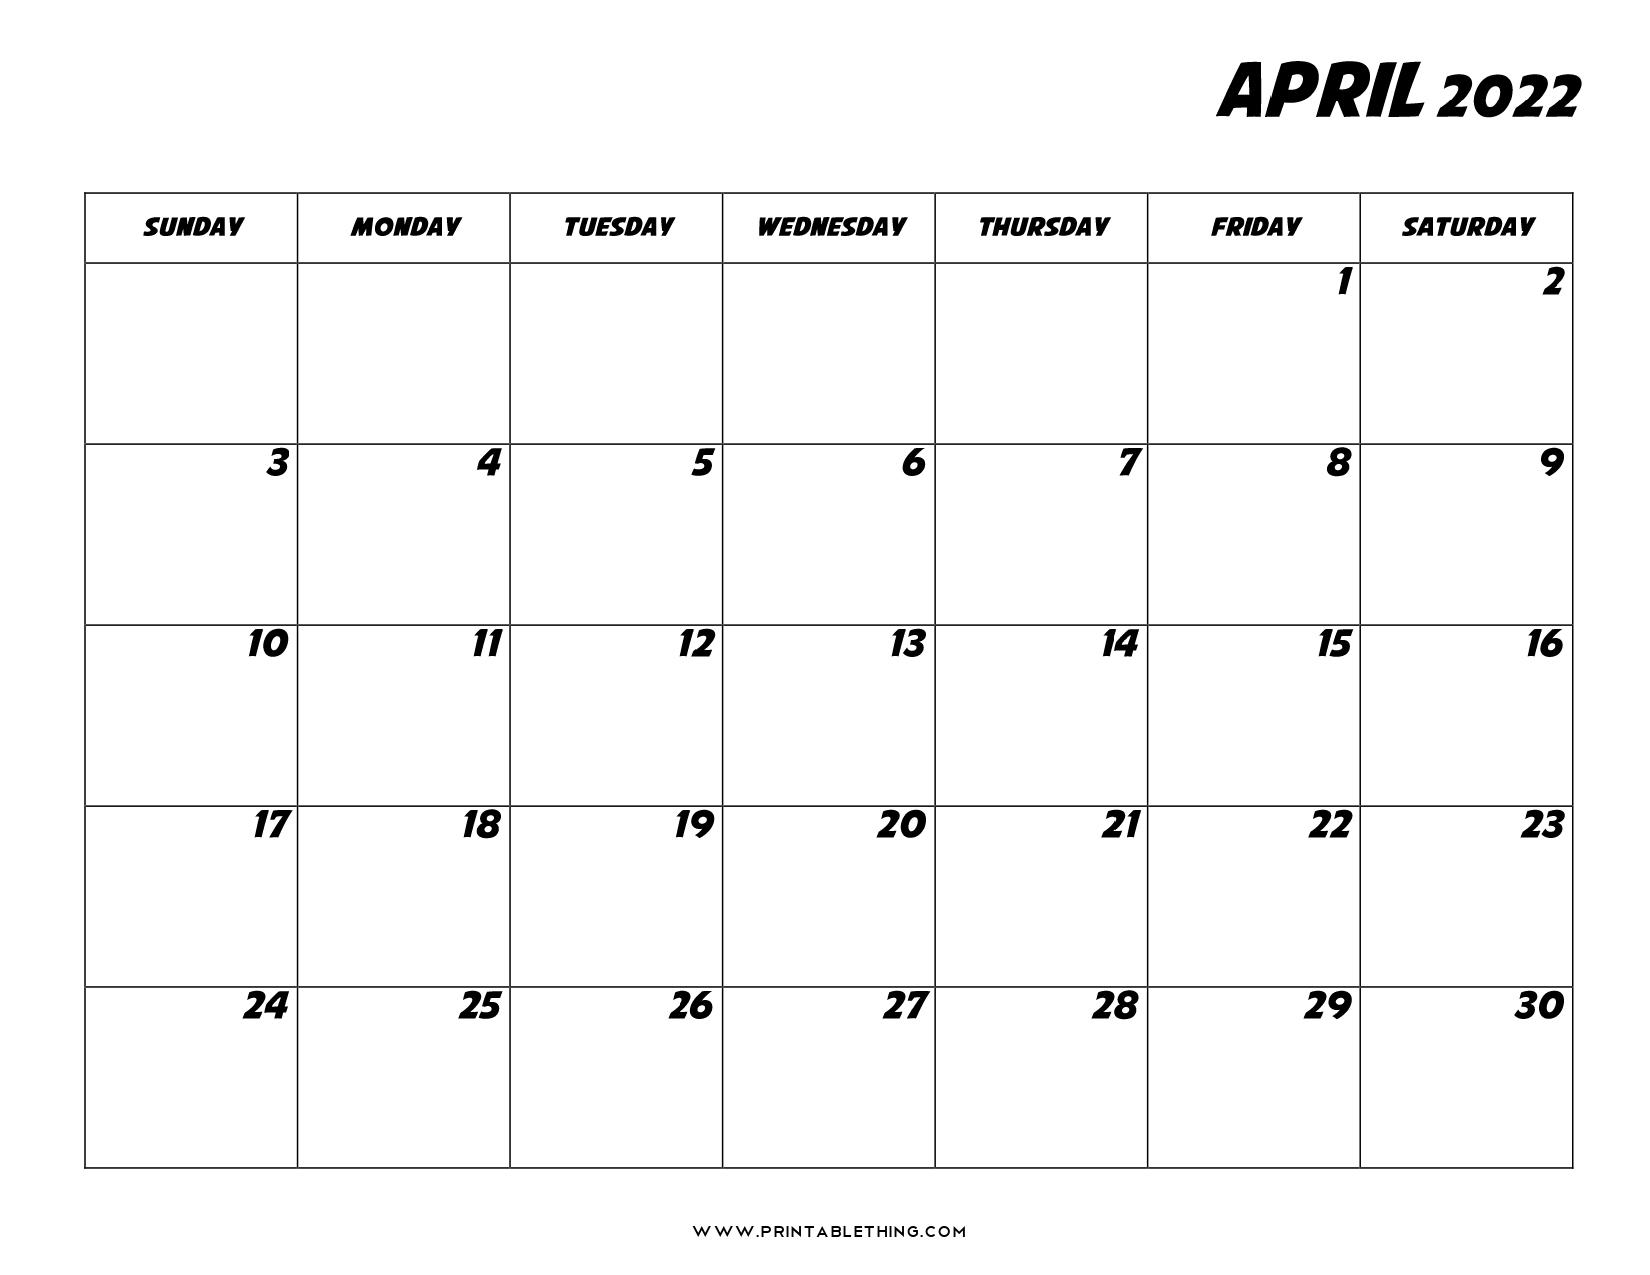 Printable Calendar April 2022.20 April 2022 Calendar Printable Pdf Us Holidays Blank Free